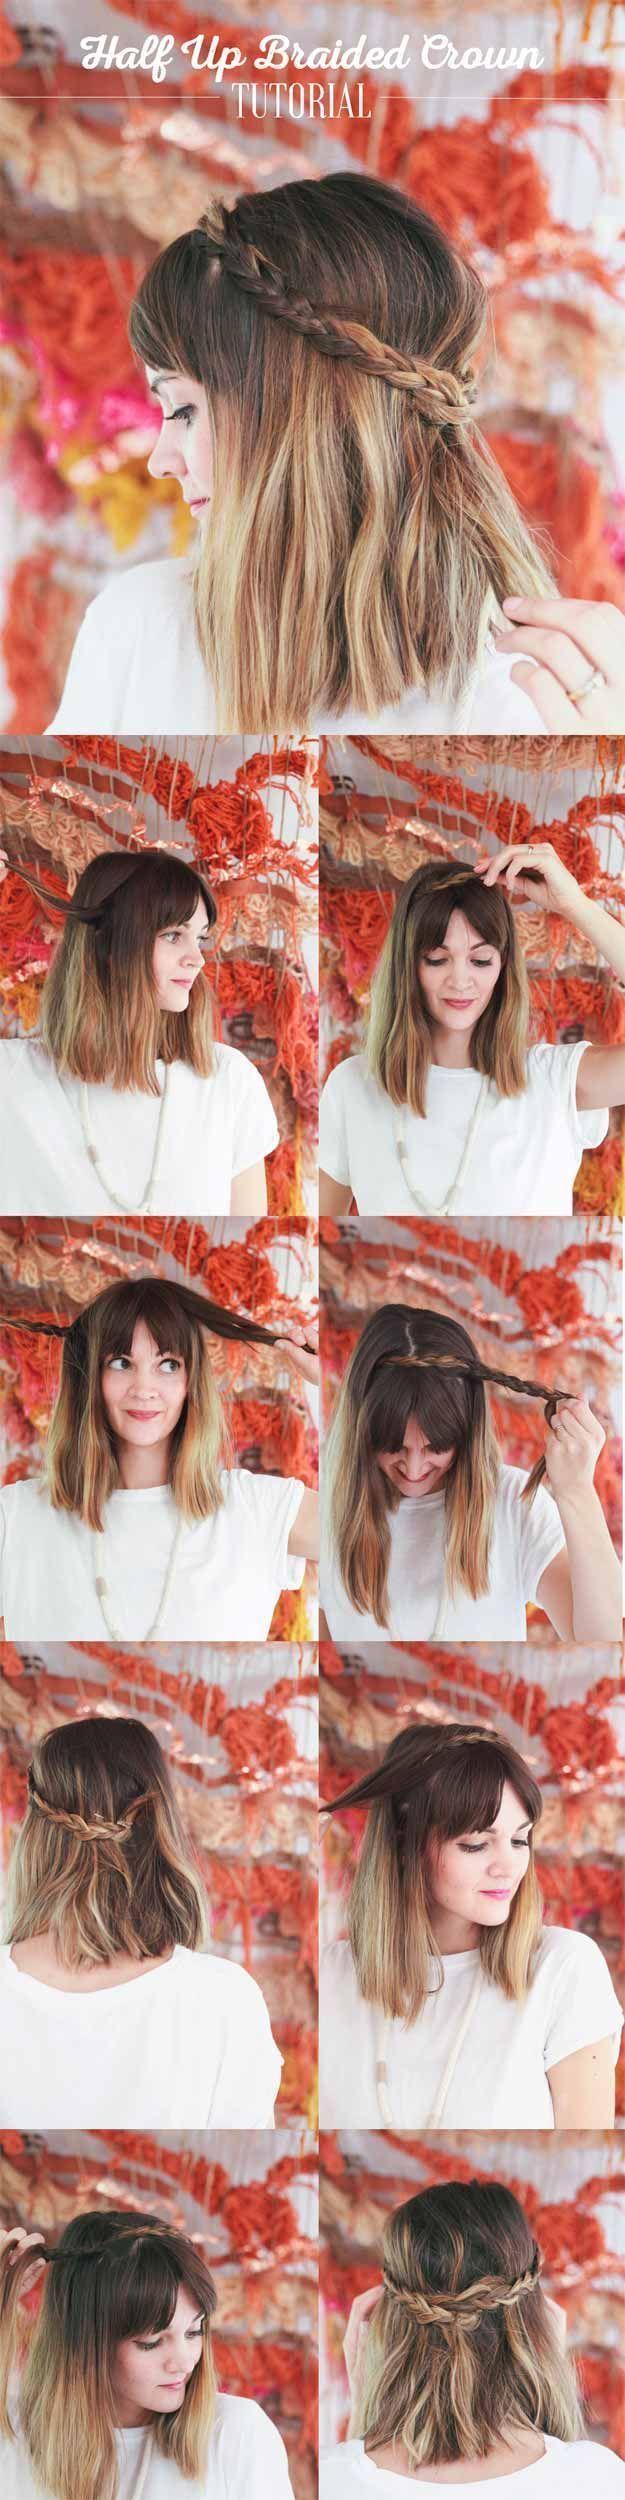 Best hairstyles for teens braided half up short shoulder lengt